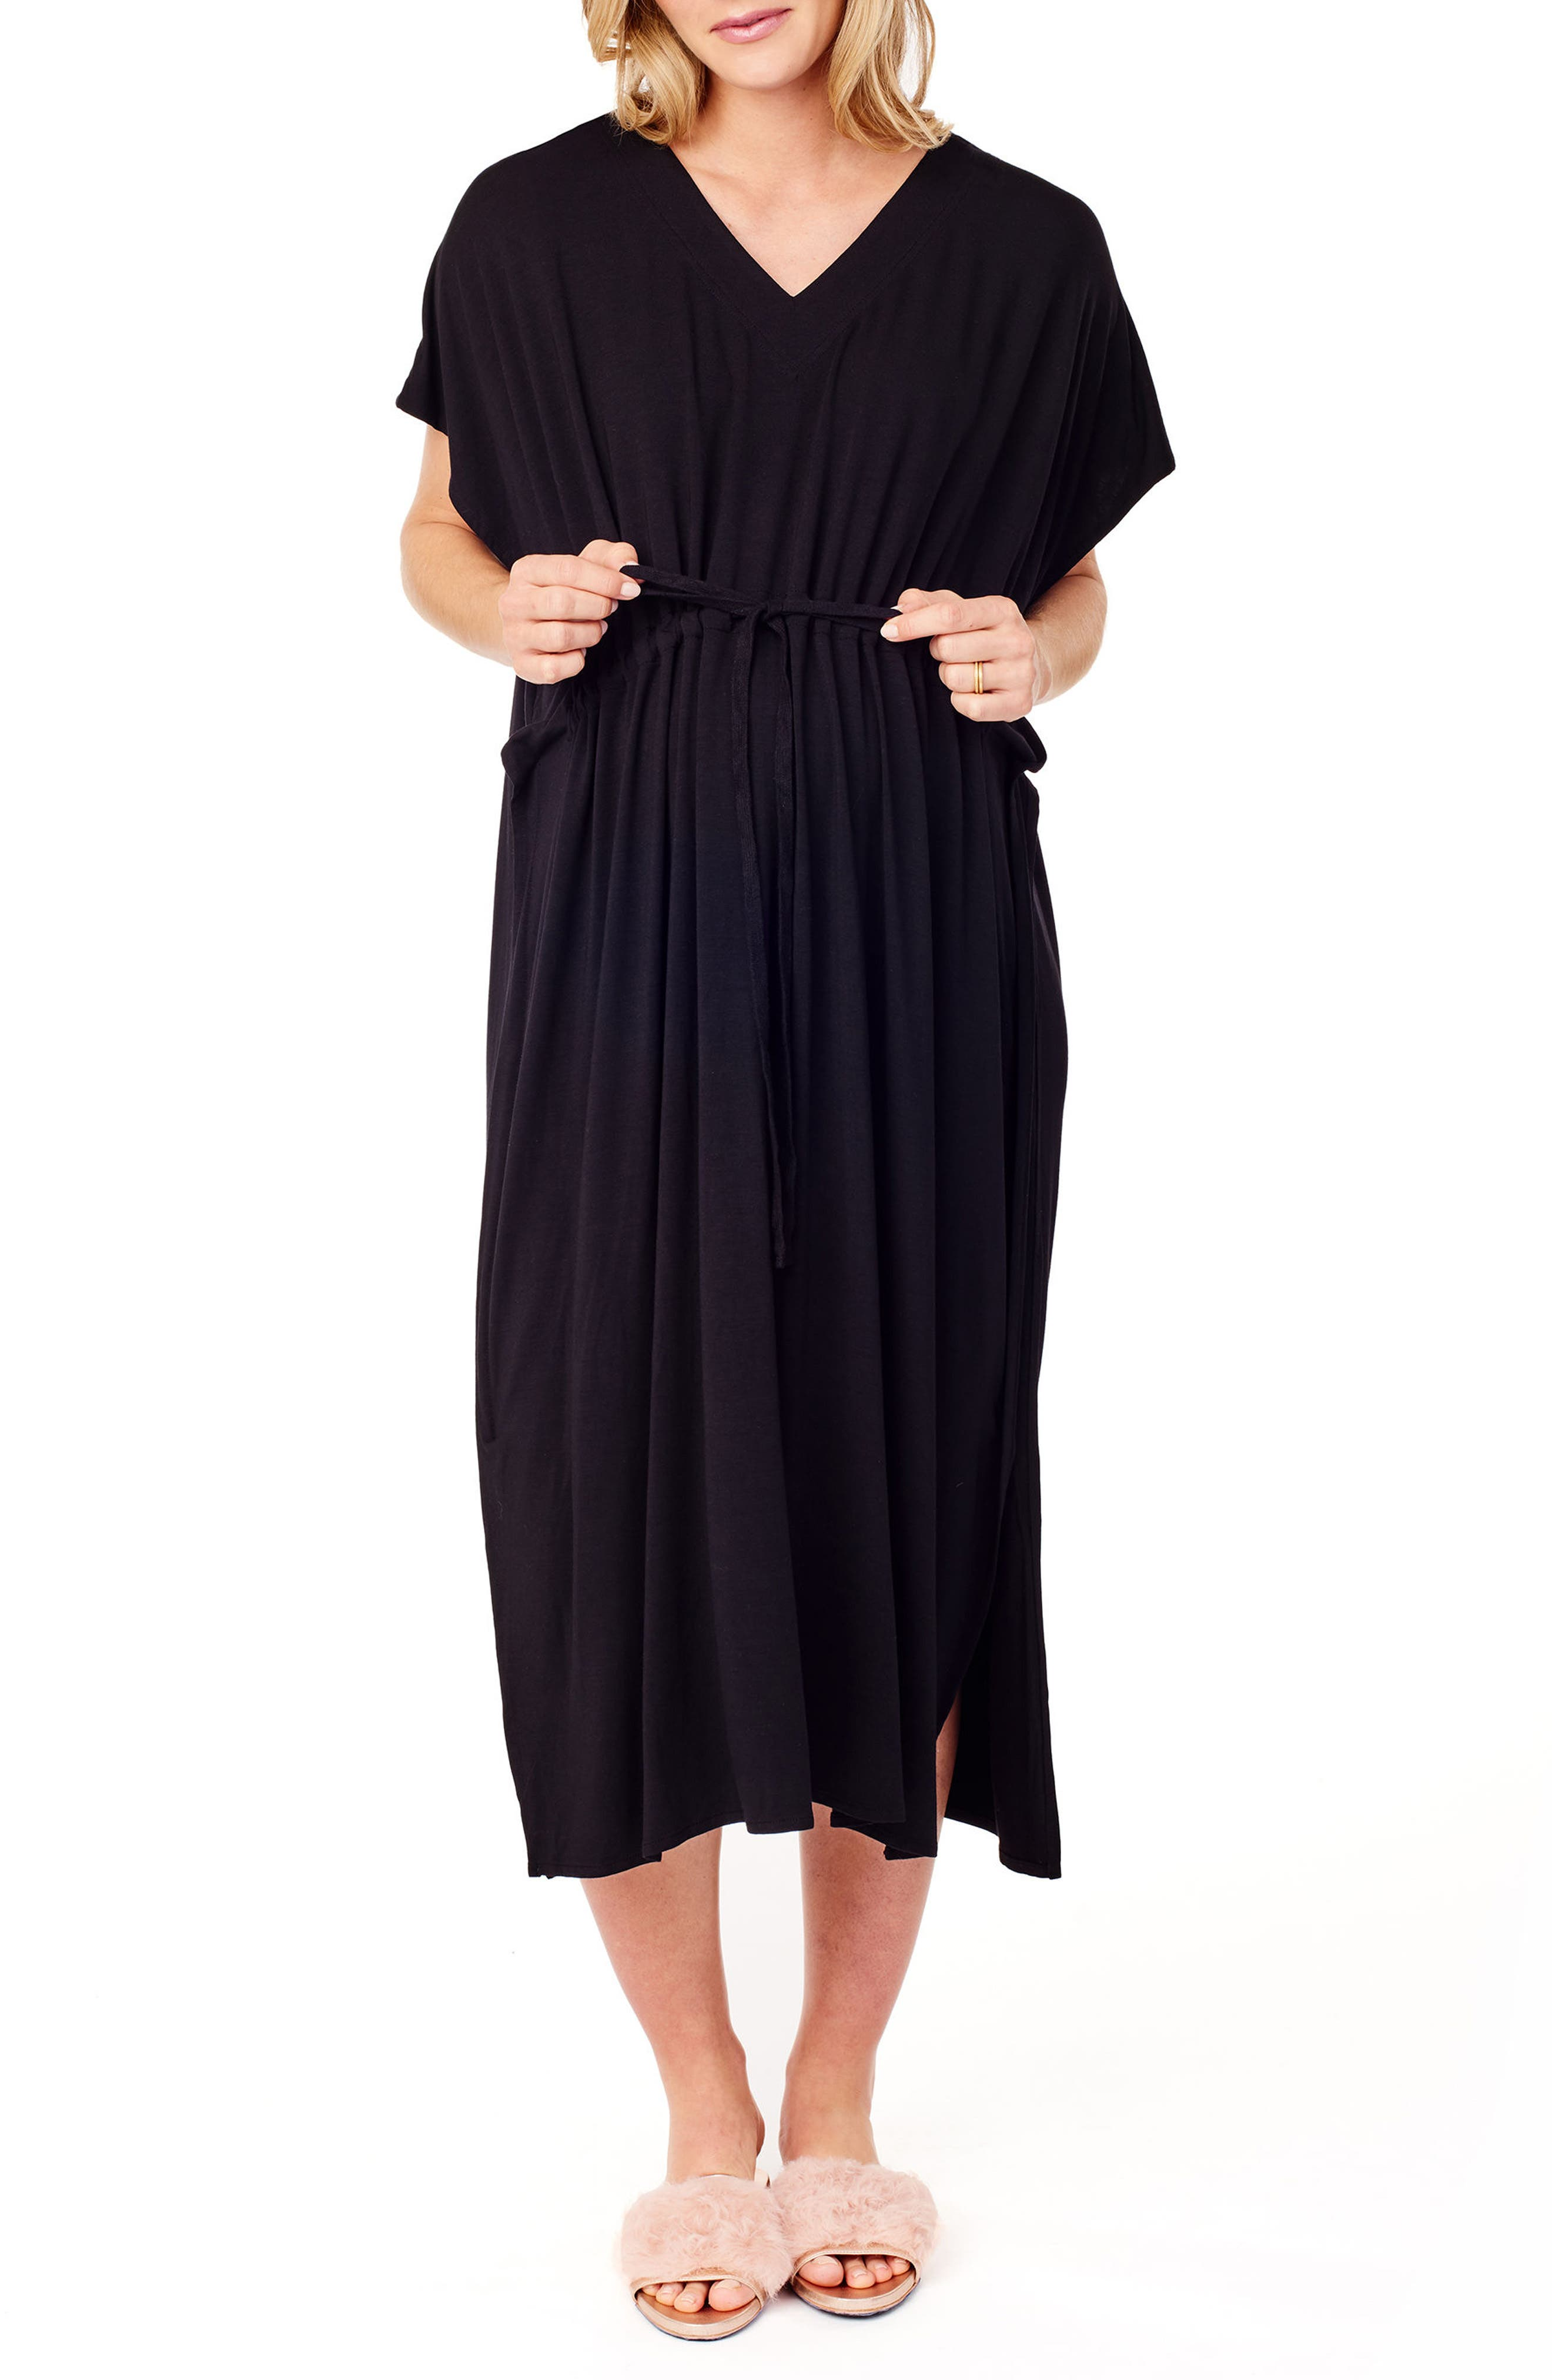 x James Fox & Co. Maternity/Nursing Hospital Gown,                             Main thumbnail 1, color,                             Jet Black